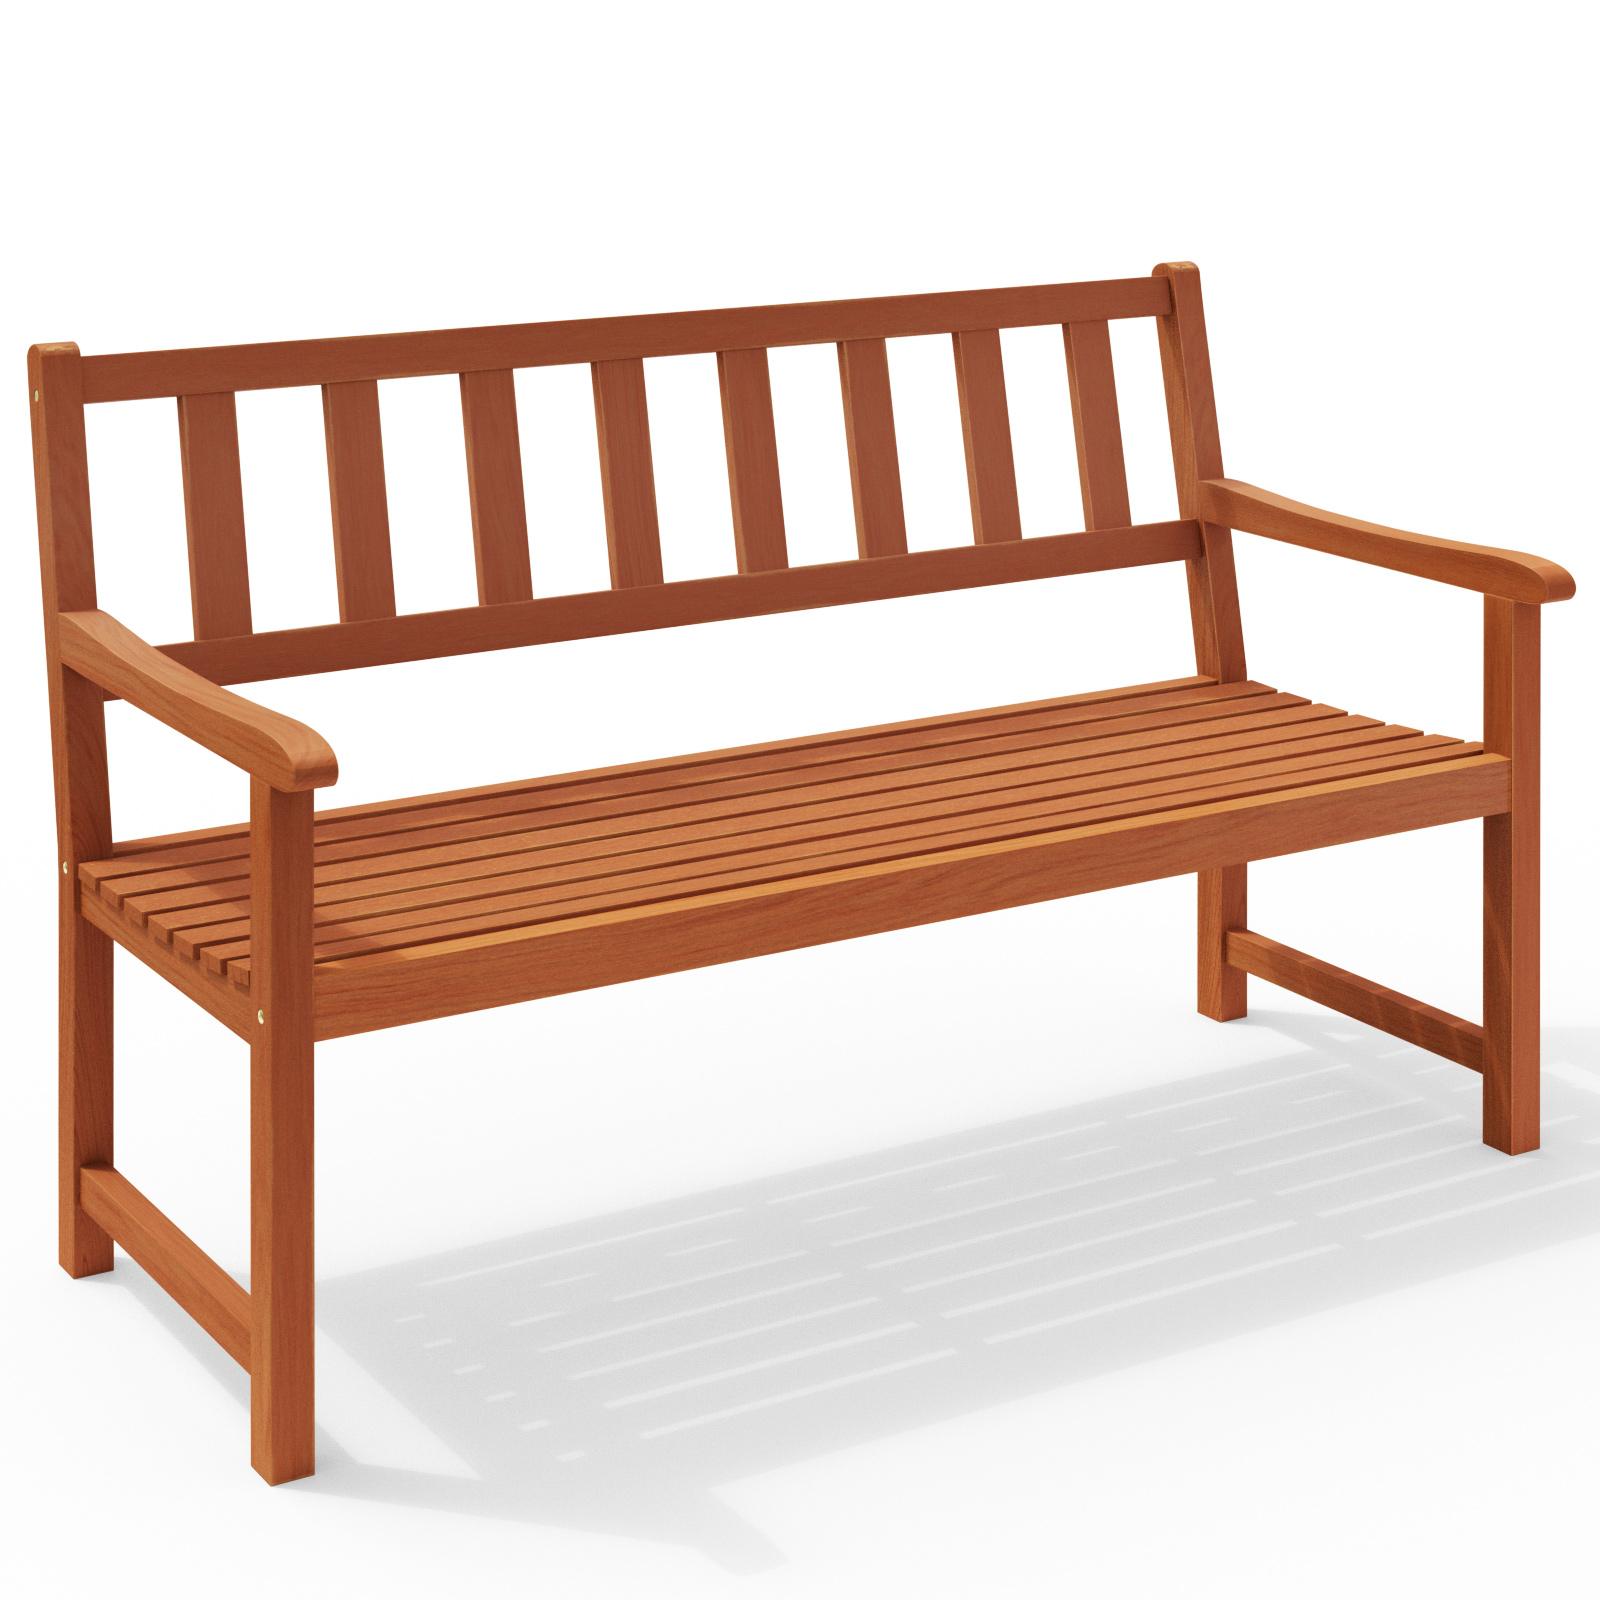 banc de jardin en bois dur acacia 120cm banc balcon terasse meuble jardin fsc ebay. Black Bedroom Furniture Sets. Home Design Ideas